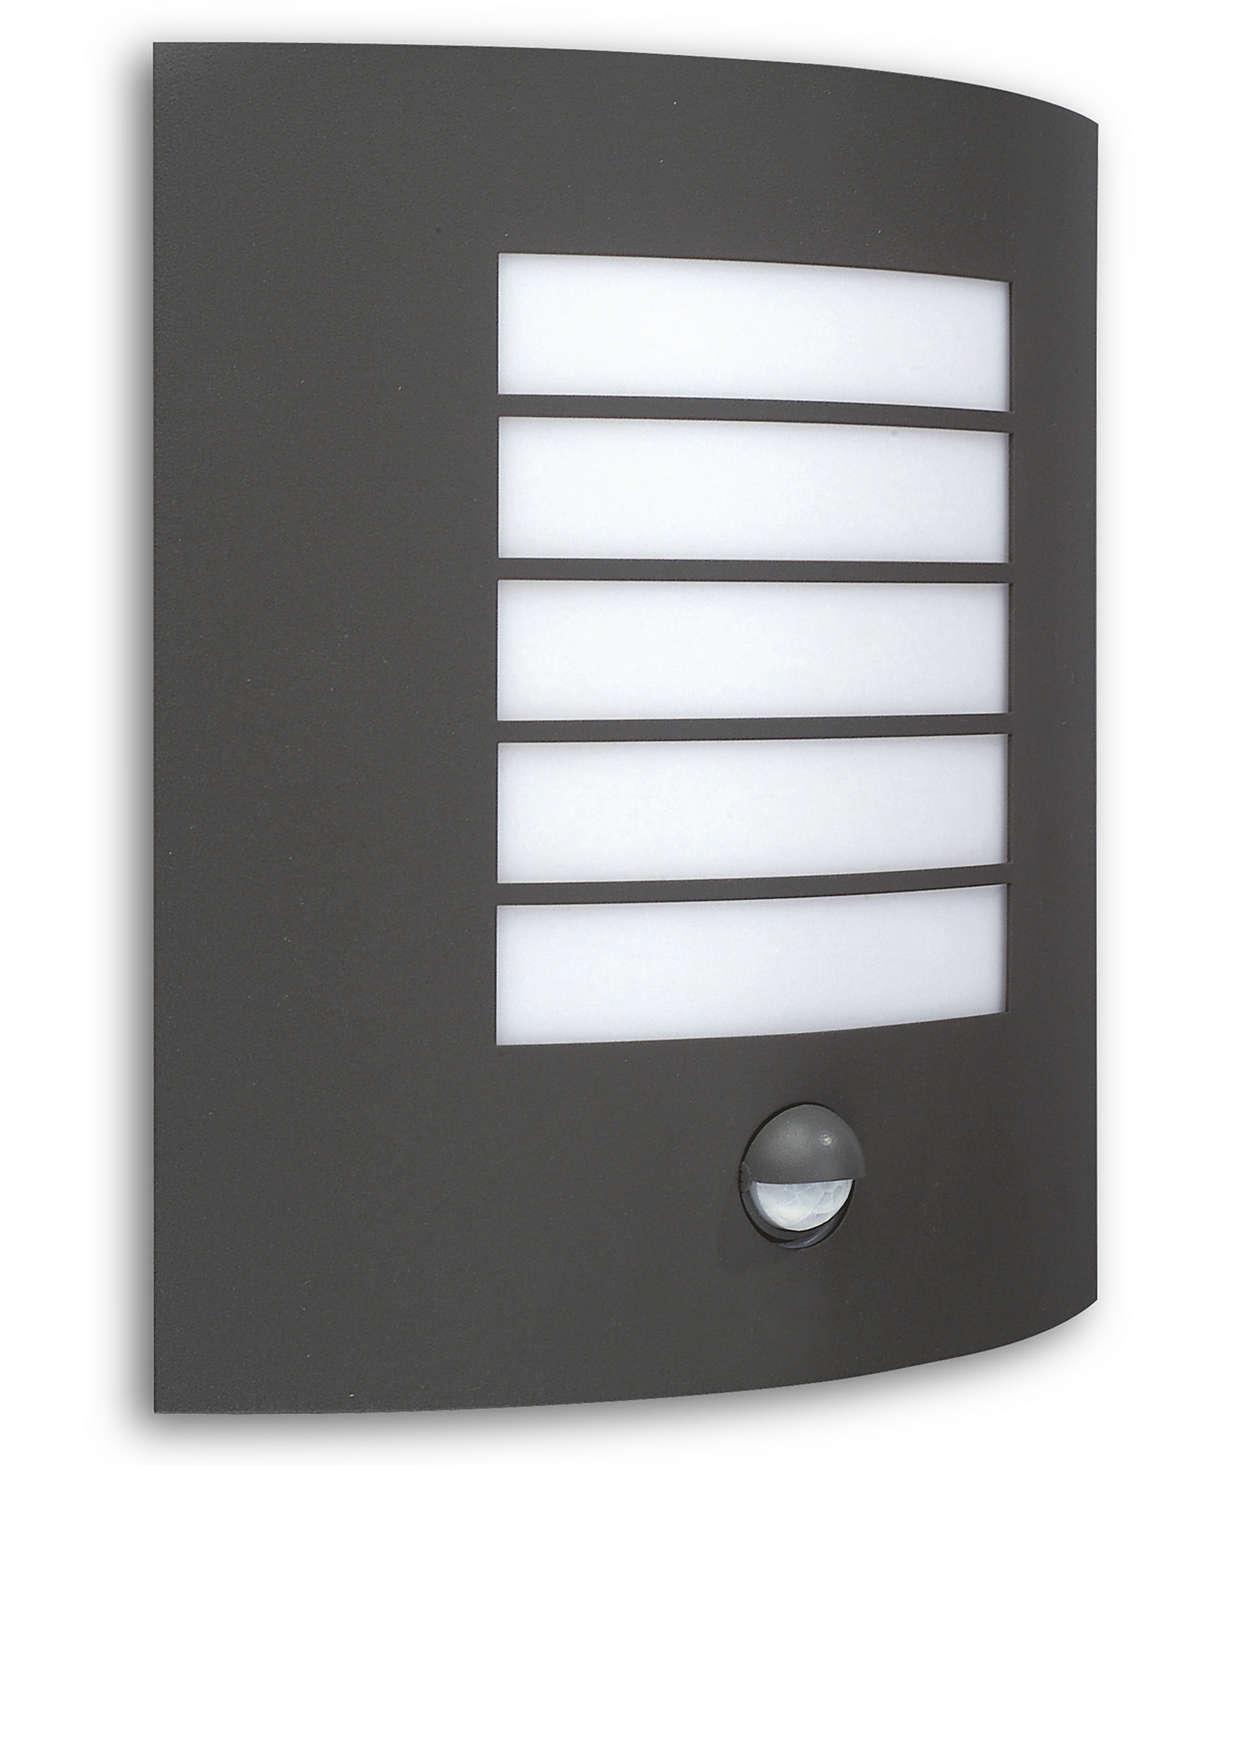 Saving energy with ambience